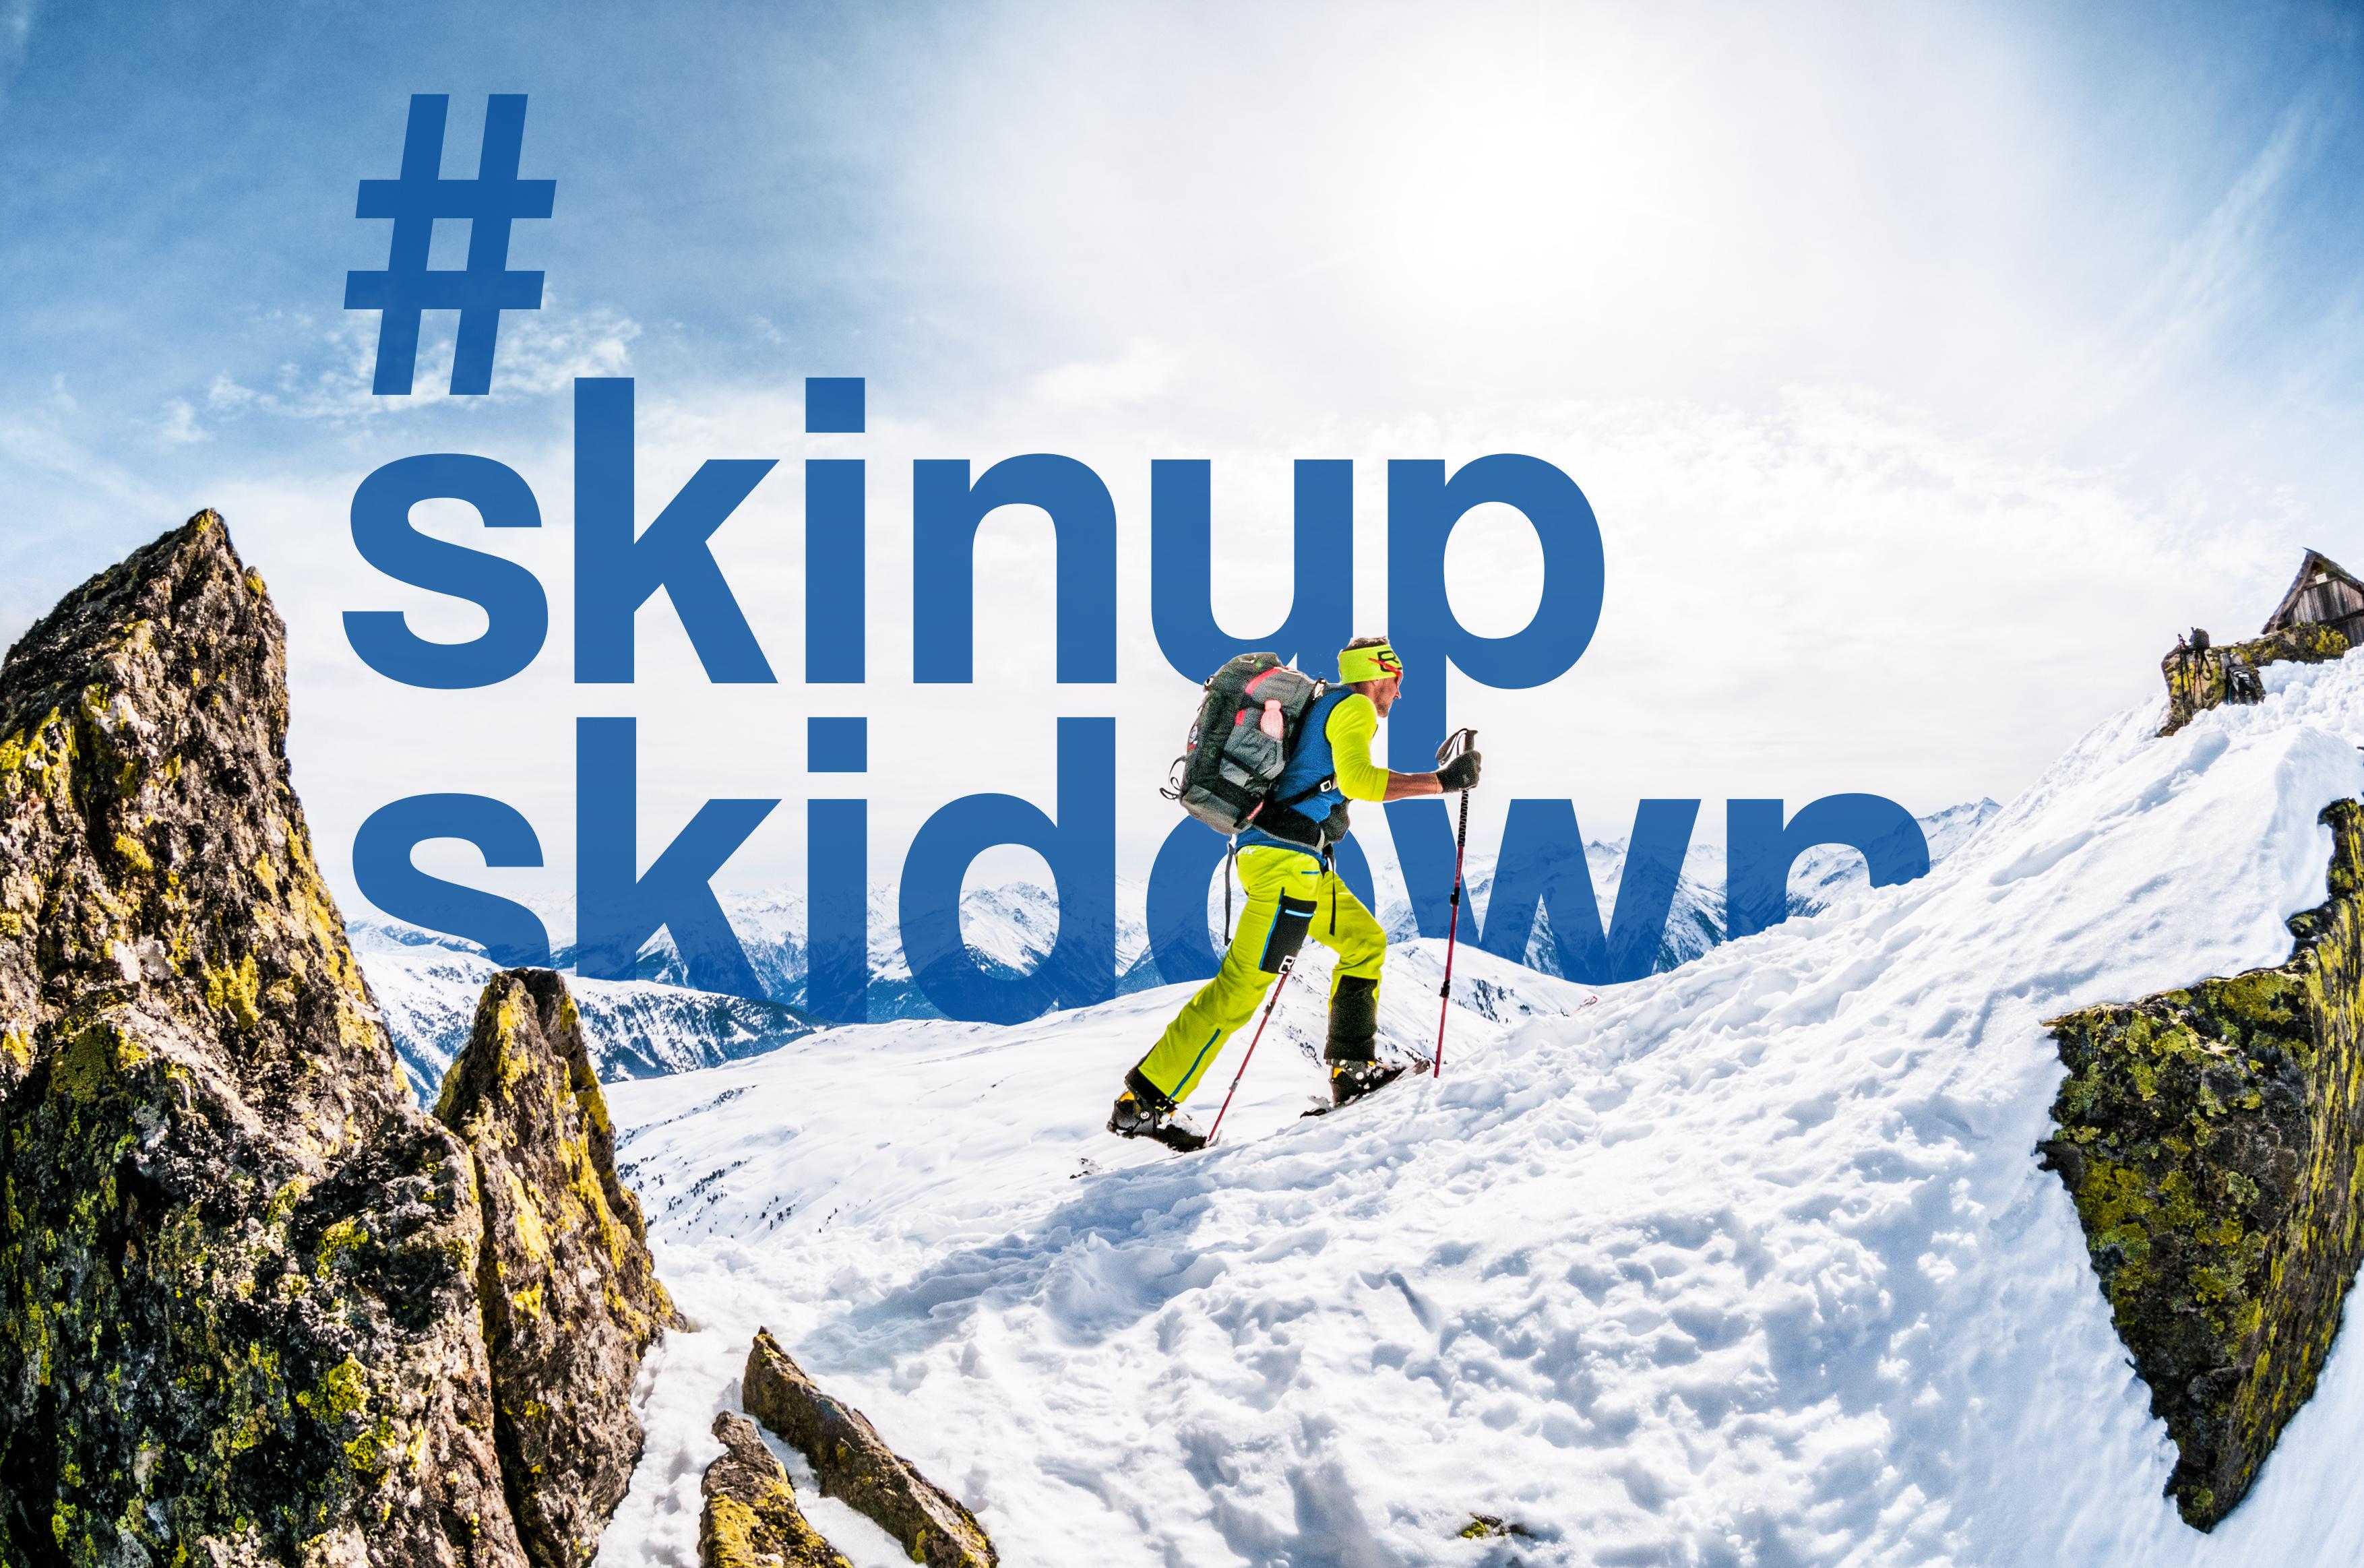 #SKINUP-SKIDOWN